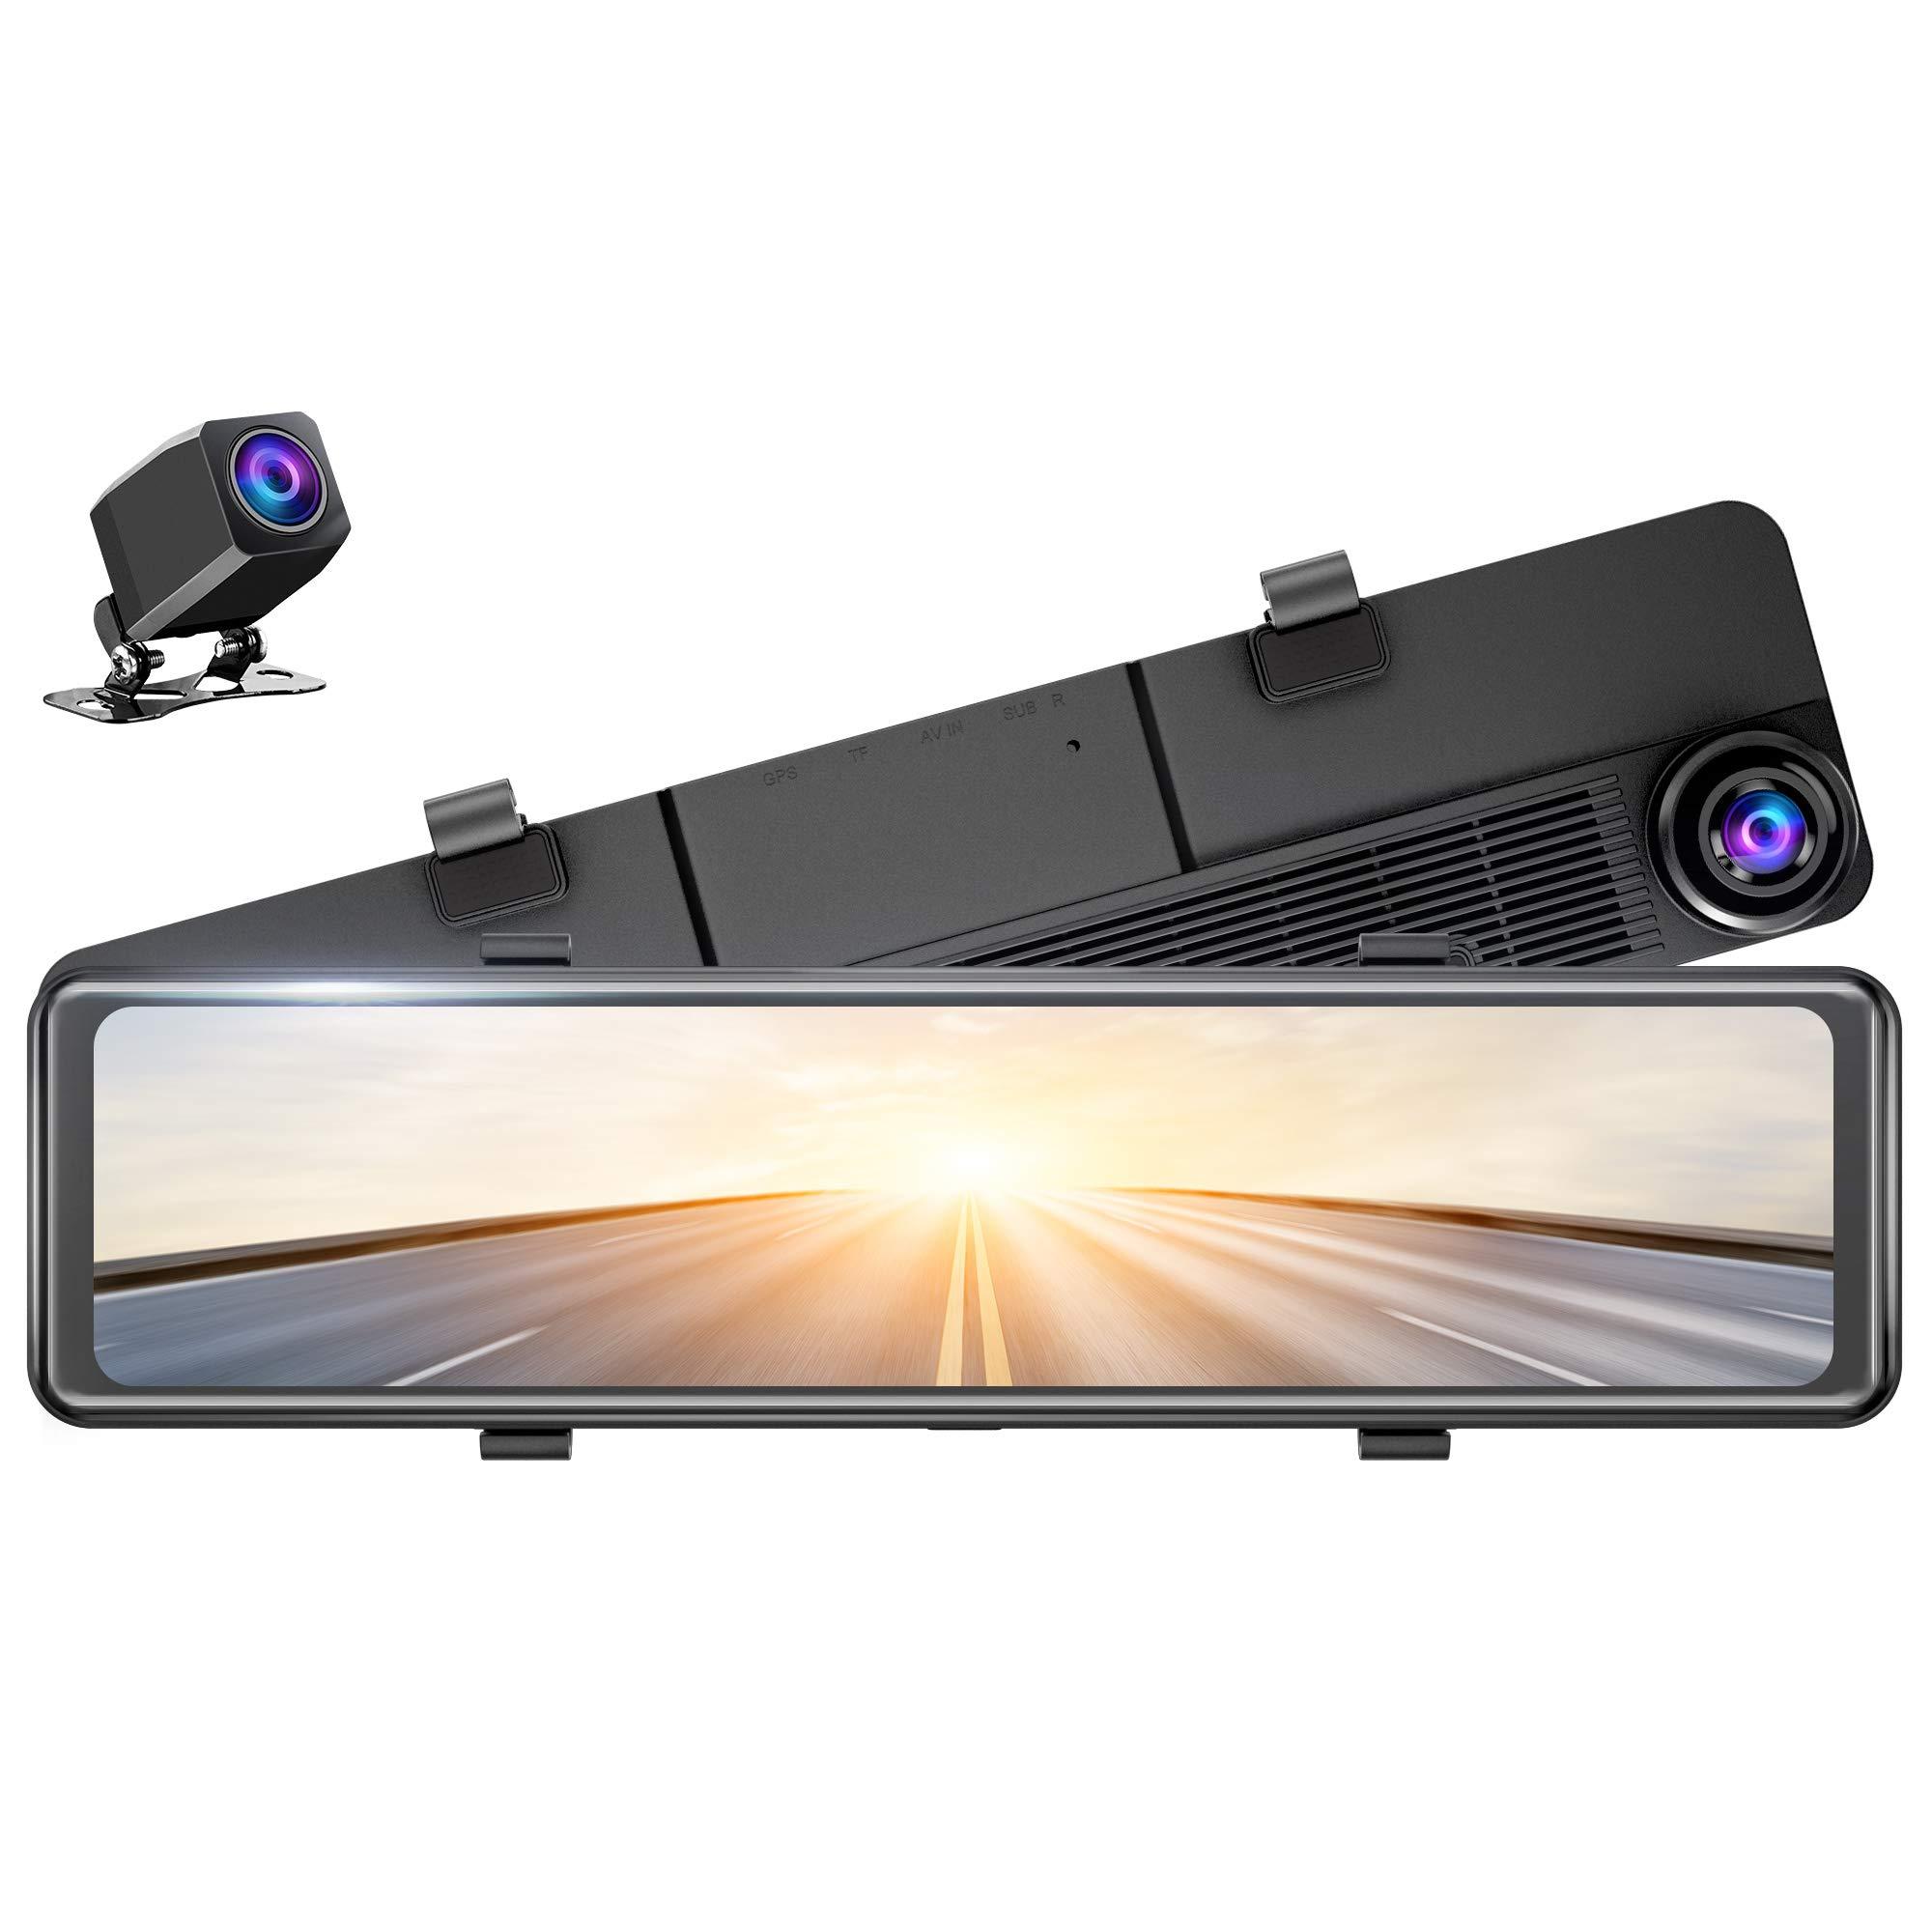 EKLEVA 12 Inch IPS Touch Screen 2K FHD Car DVR Dash Camera Dual Lens Video Stream Media Recorder Rearview Mirror 1080P Back Camera Mirror Dash Cam with Night Vision /& Parking Monitor